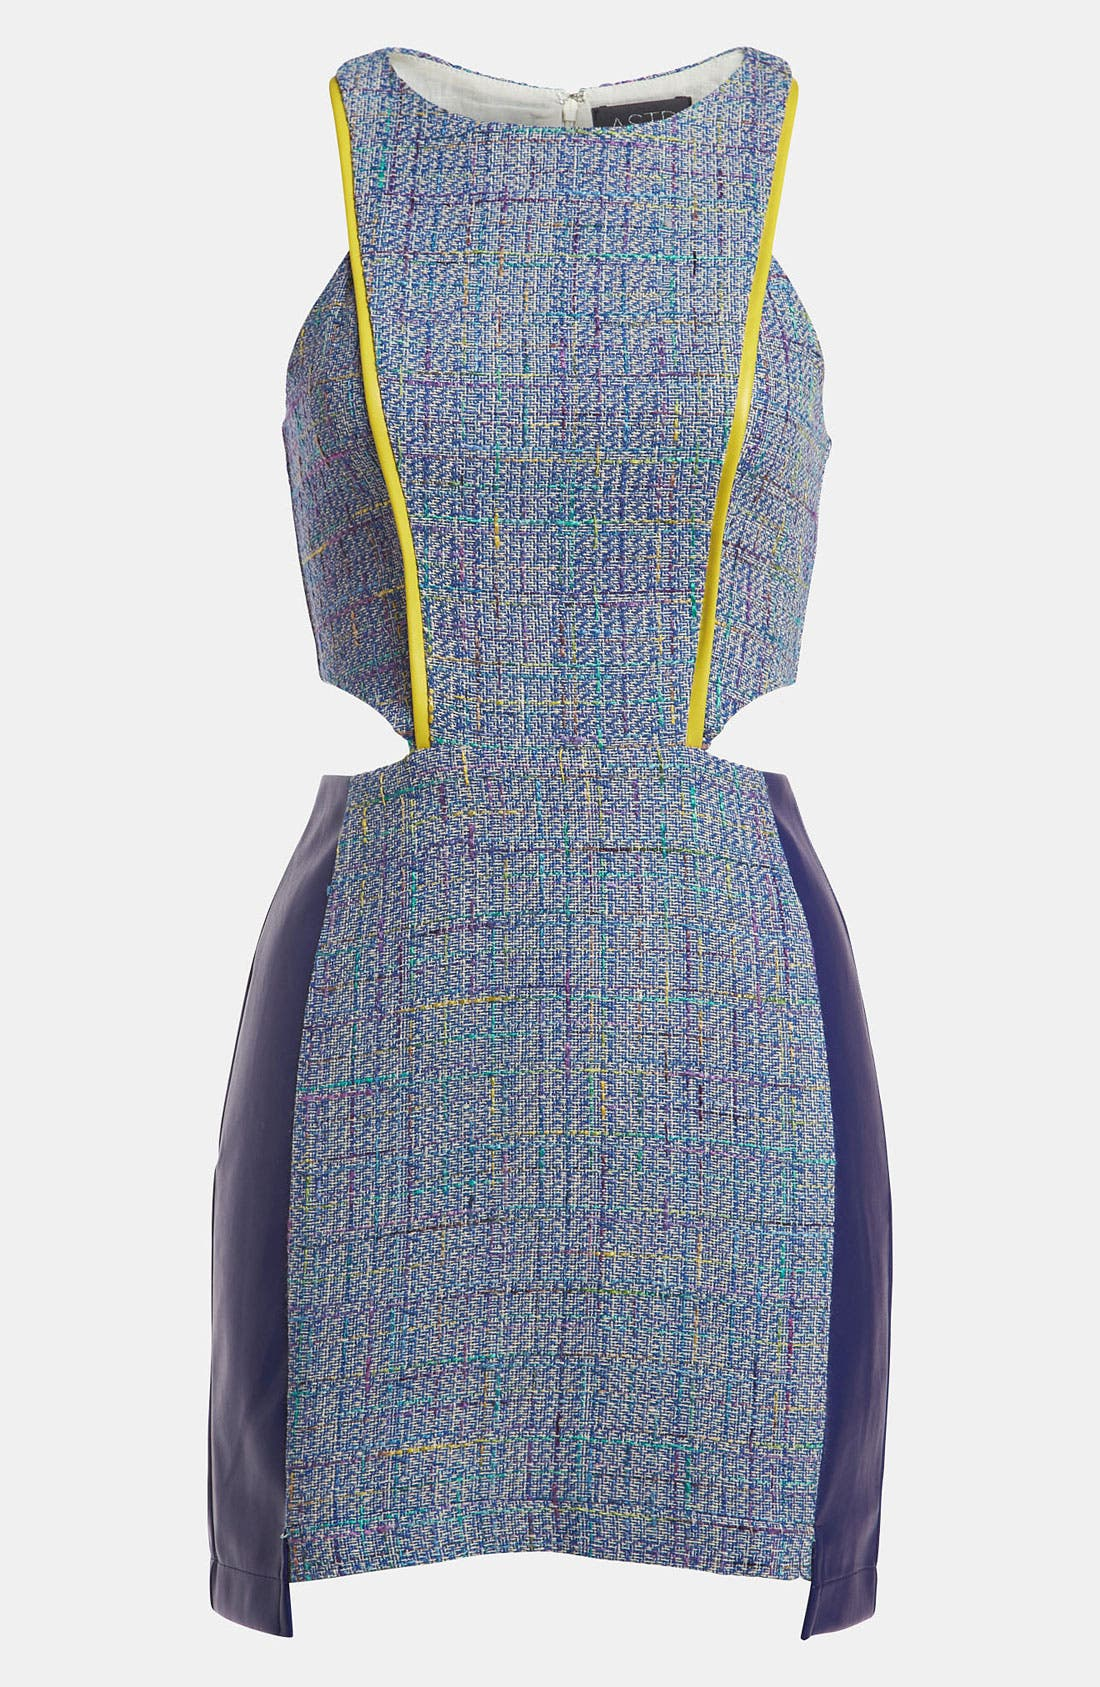 Alternate Image 1 Selected - ASTR Mixed Media Tweed Dress